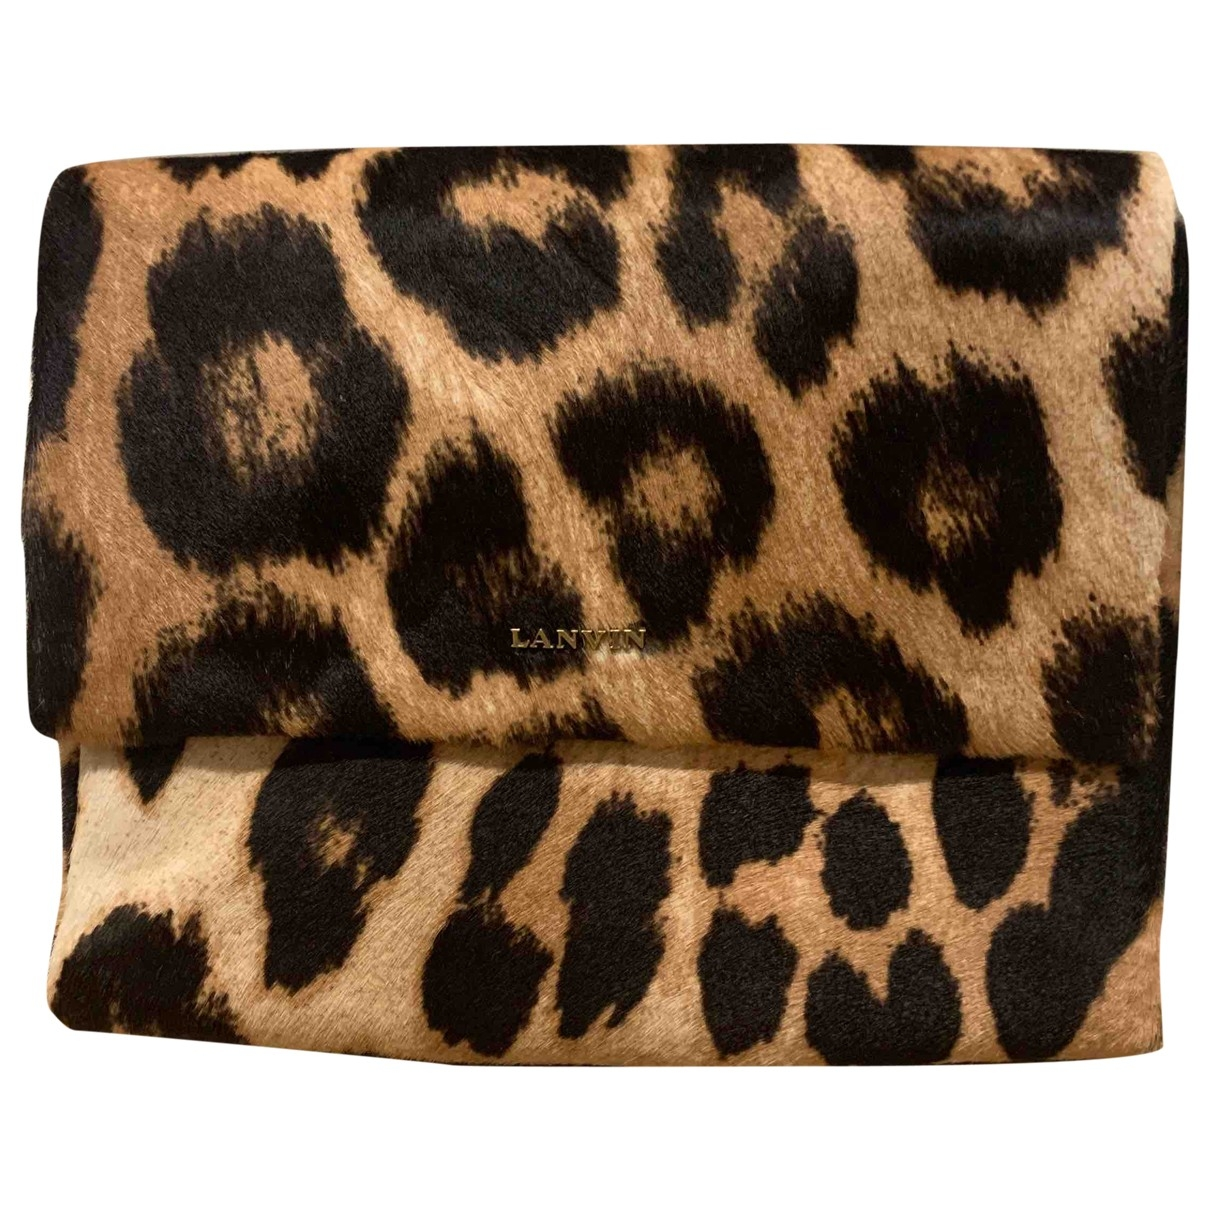 Lanvin Happy Beige Pony-style calfskin handbag for Women \N